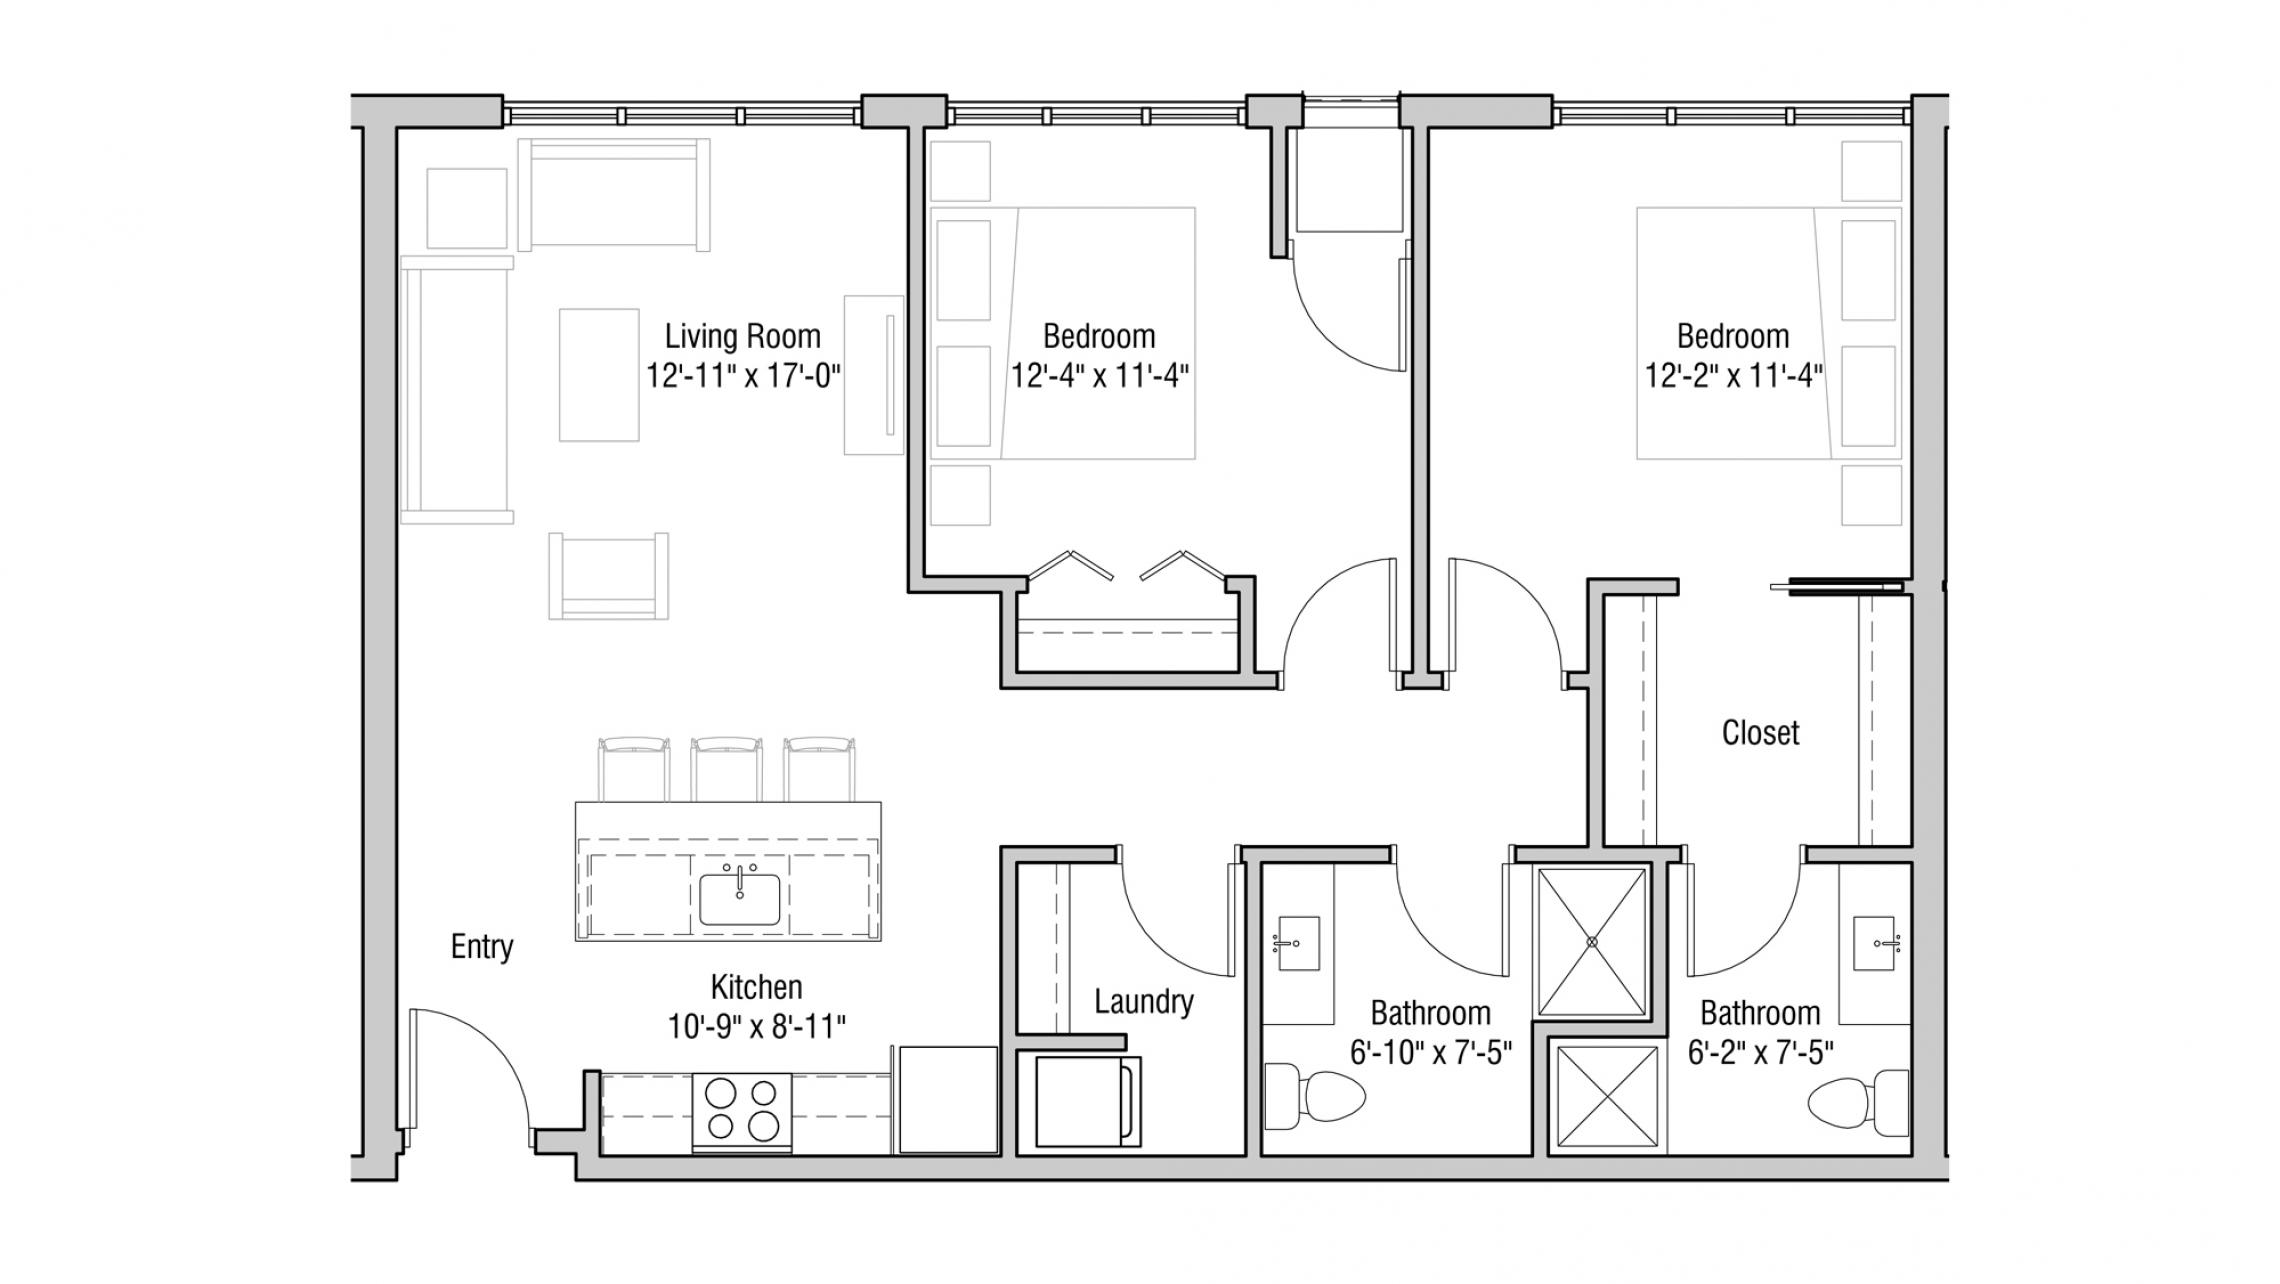 ULI Quarter Row 417 - Two Bedroom, Two Bathroom